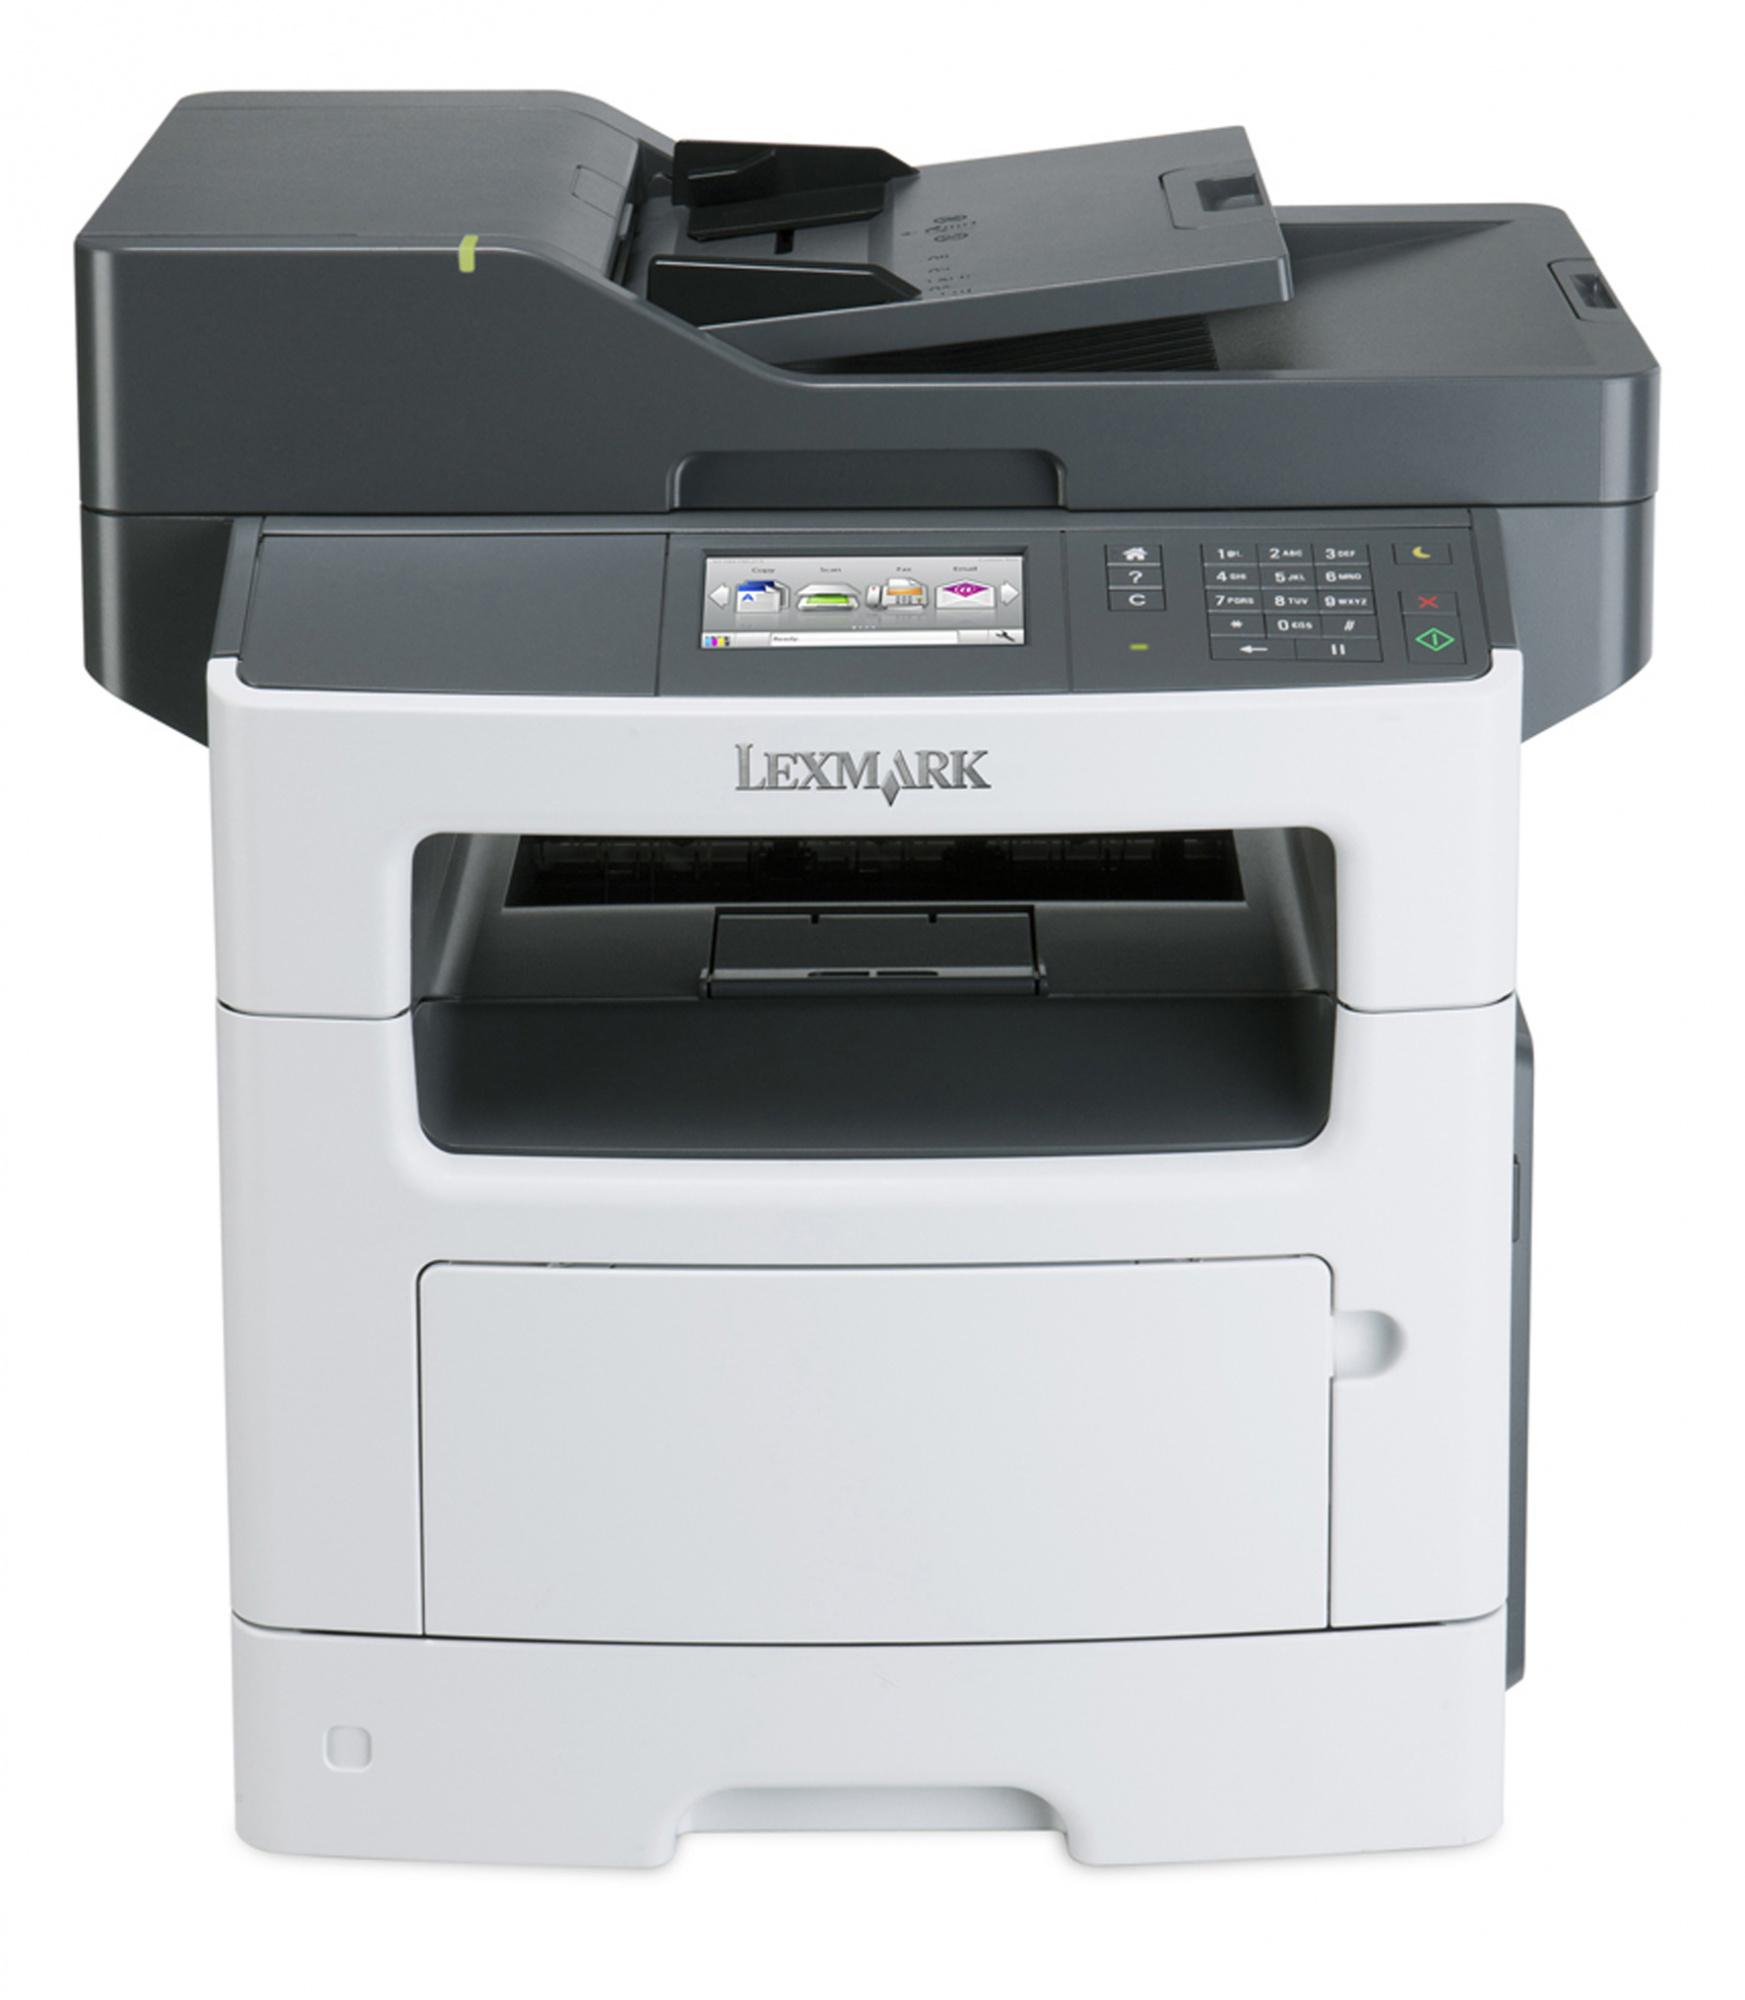 Lexmark MX511de (35S5803) - лазерное монохромное МФУ от iCover